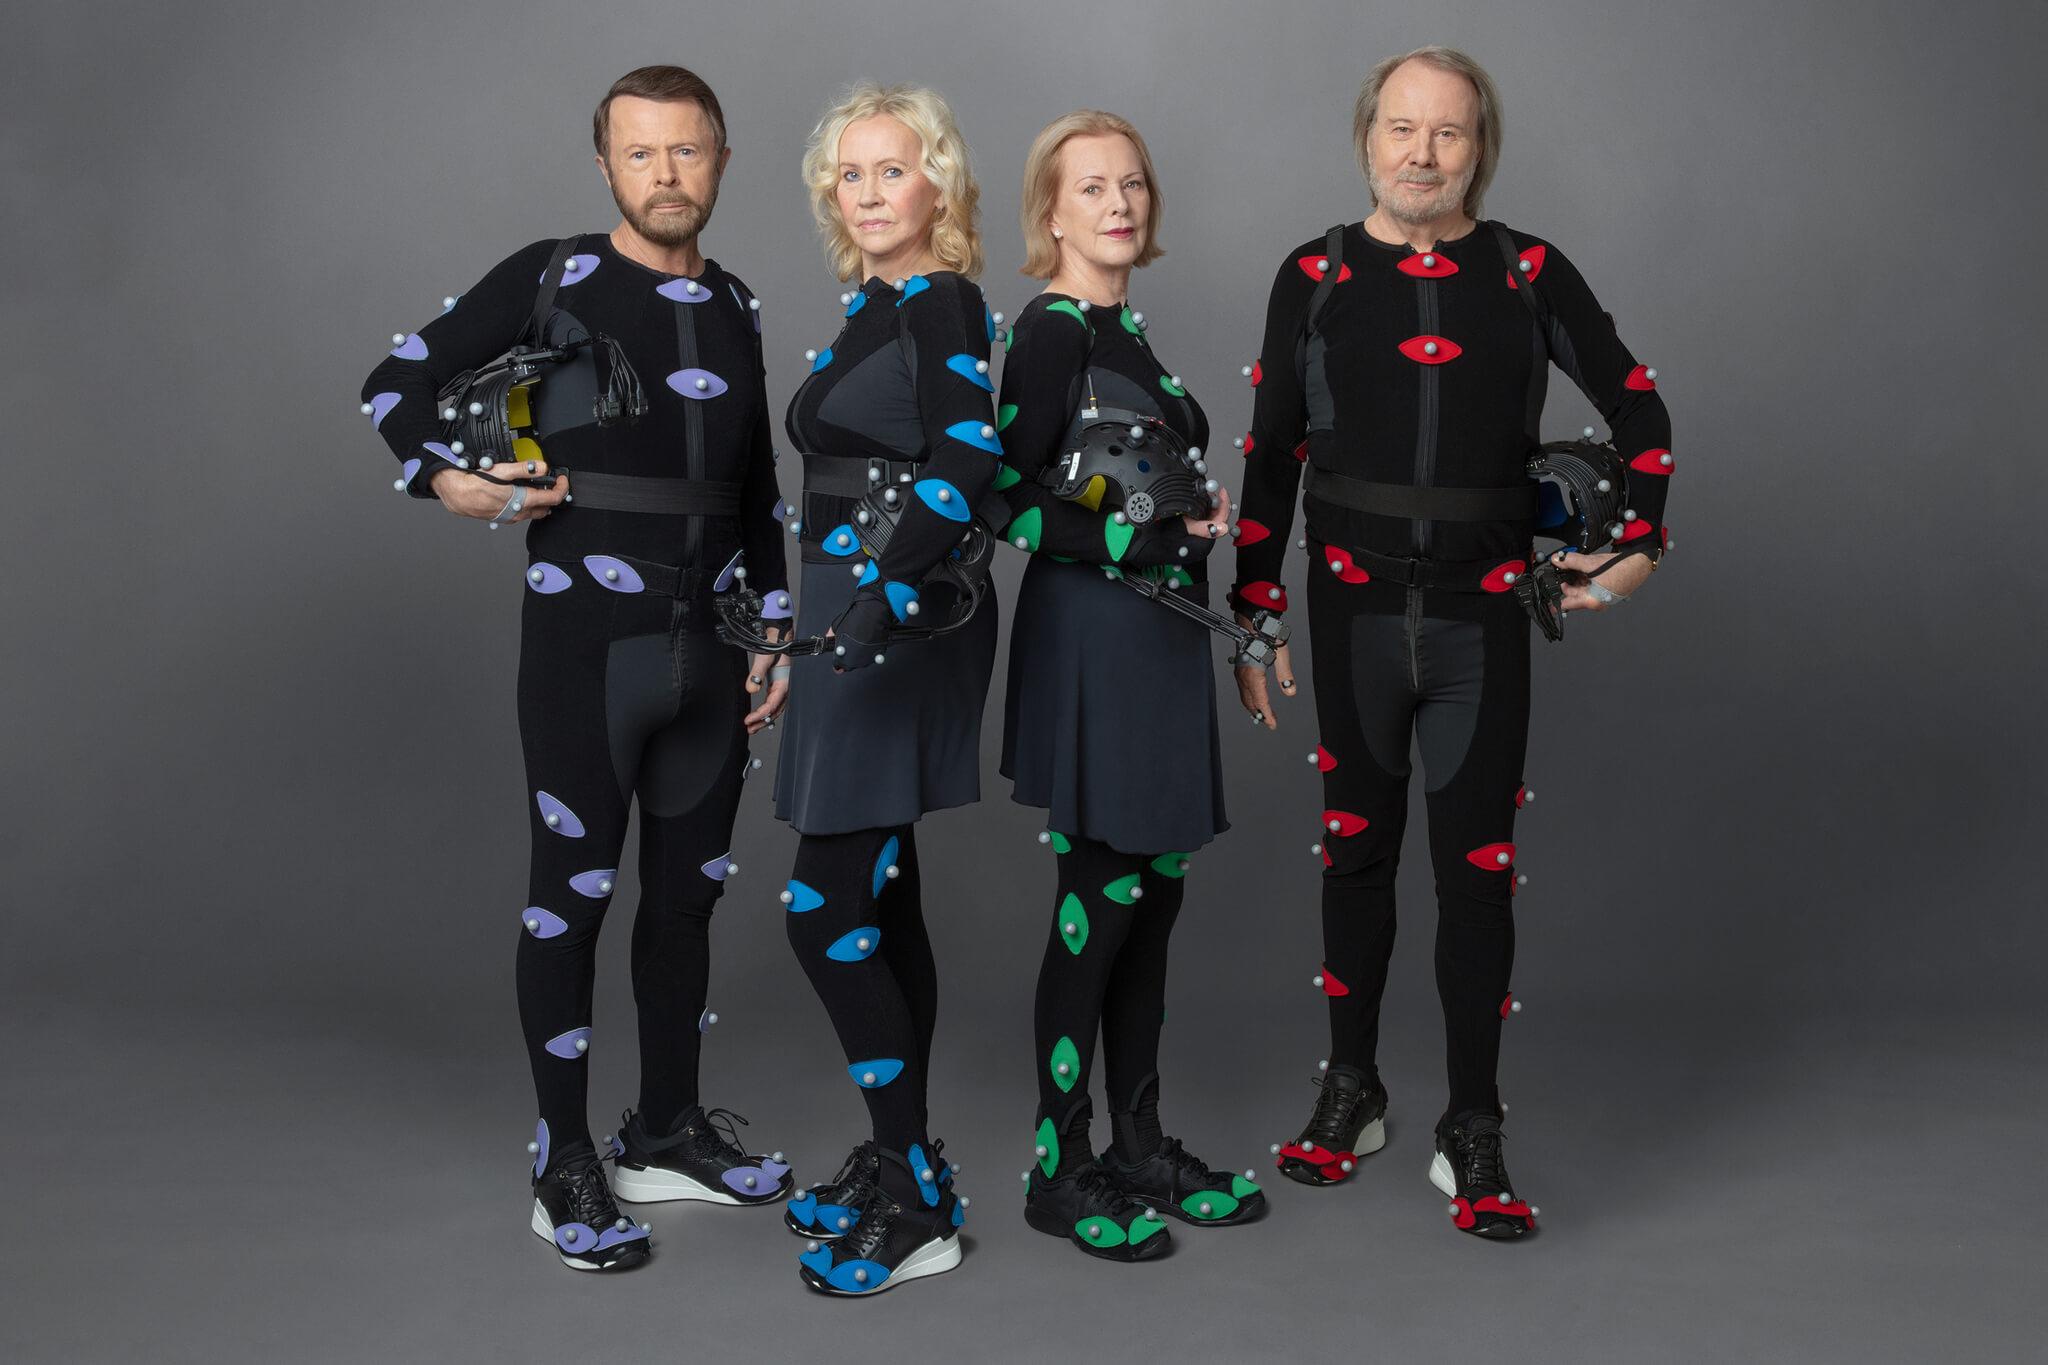 ABBAが40年ぶりに復活!完全新作スタジオ・アルバム『Voyage』が11月5日に発売決定、先行シングル2曲も配信。来年5月からはコンサートも開催